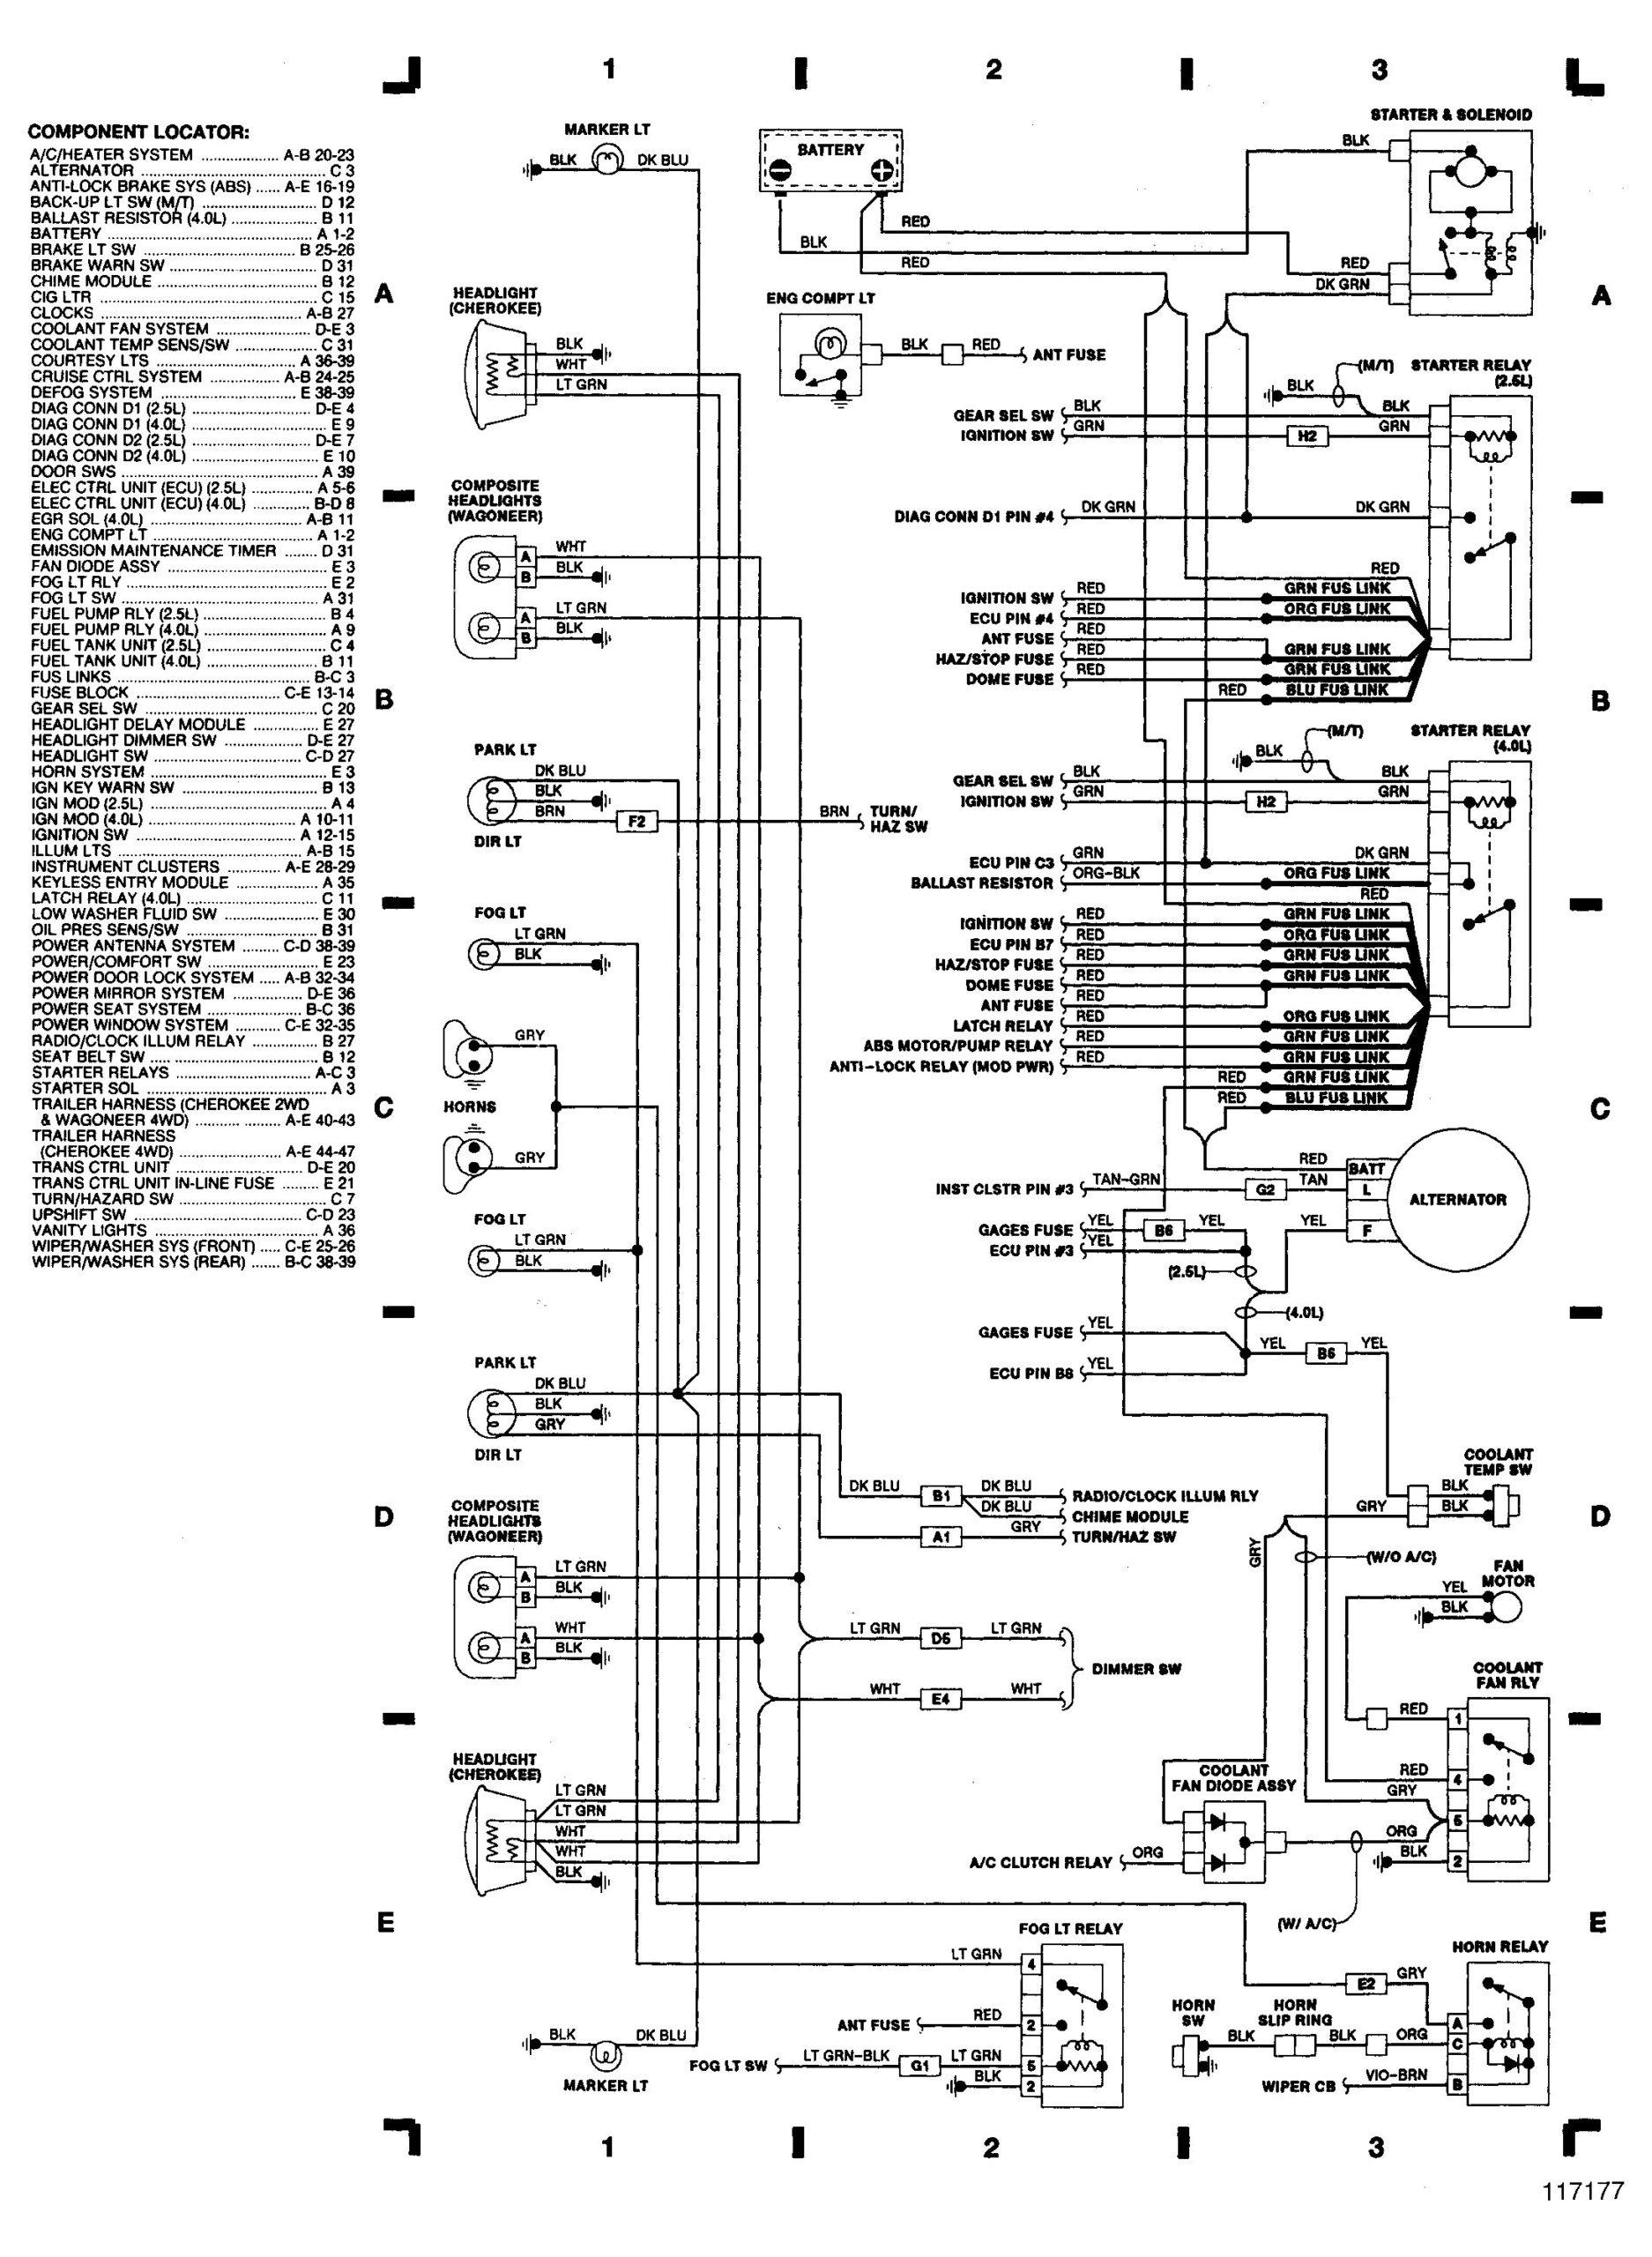 2000 Jeep Grand Cherokee Trailer Wiring Diagram